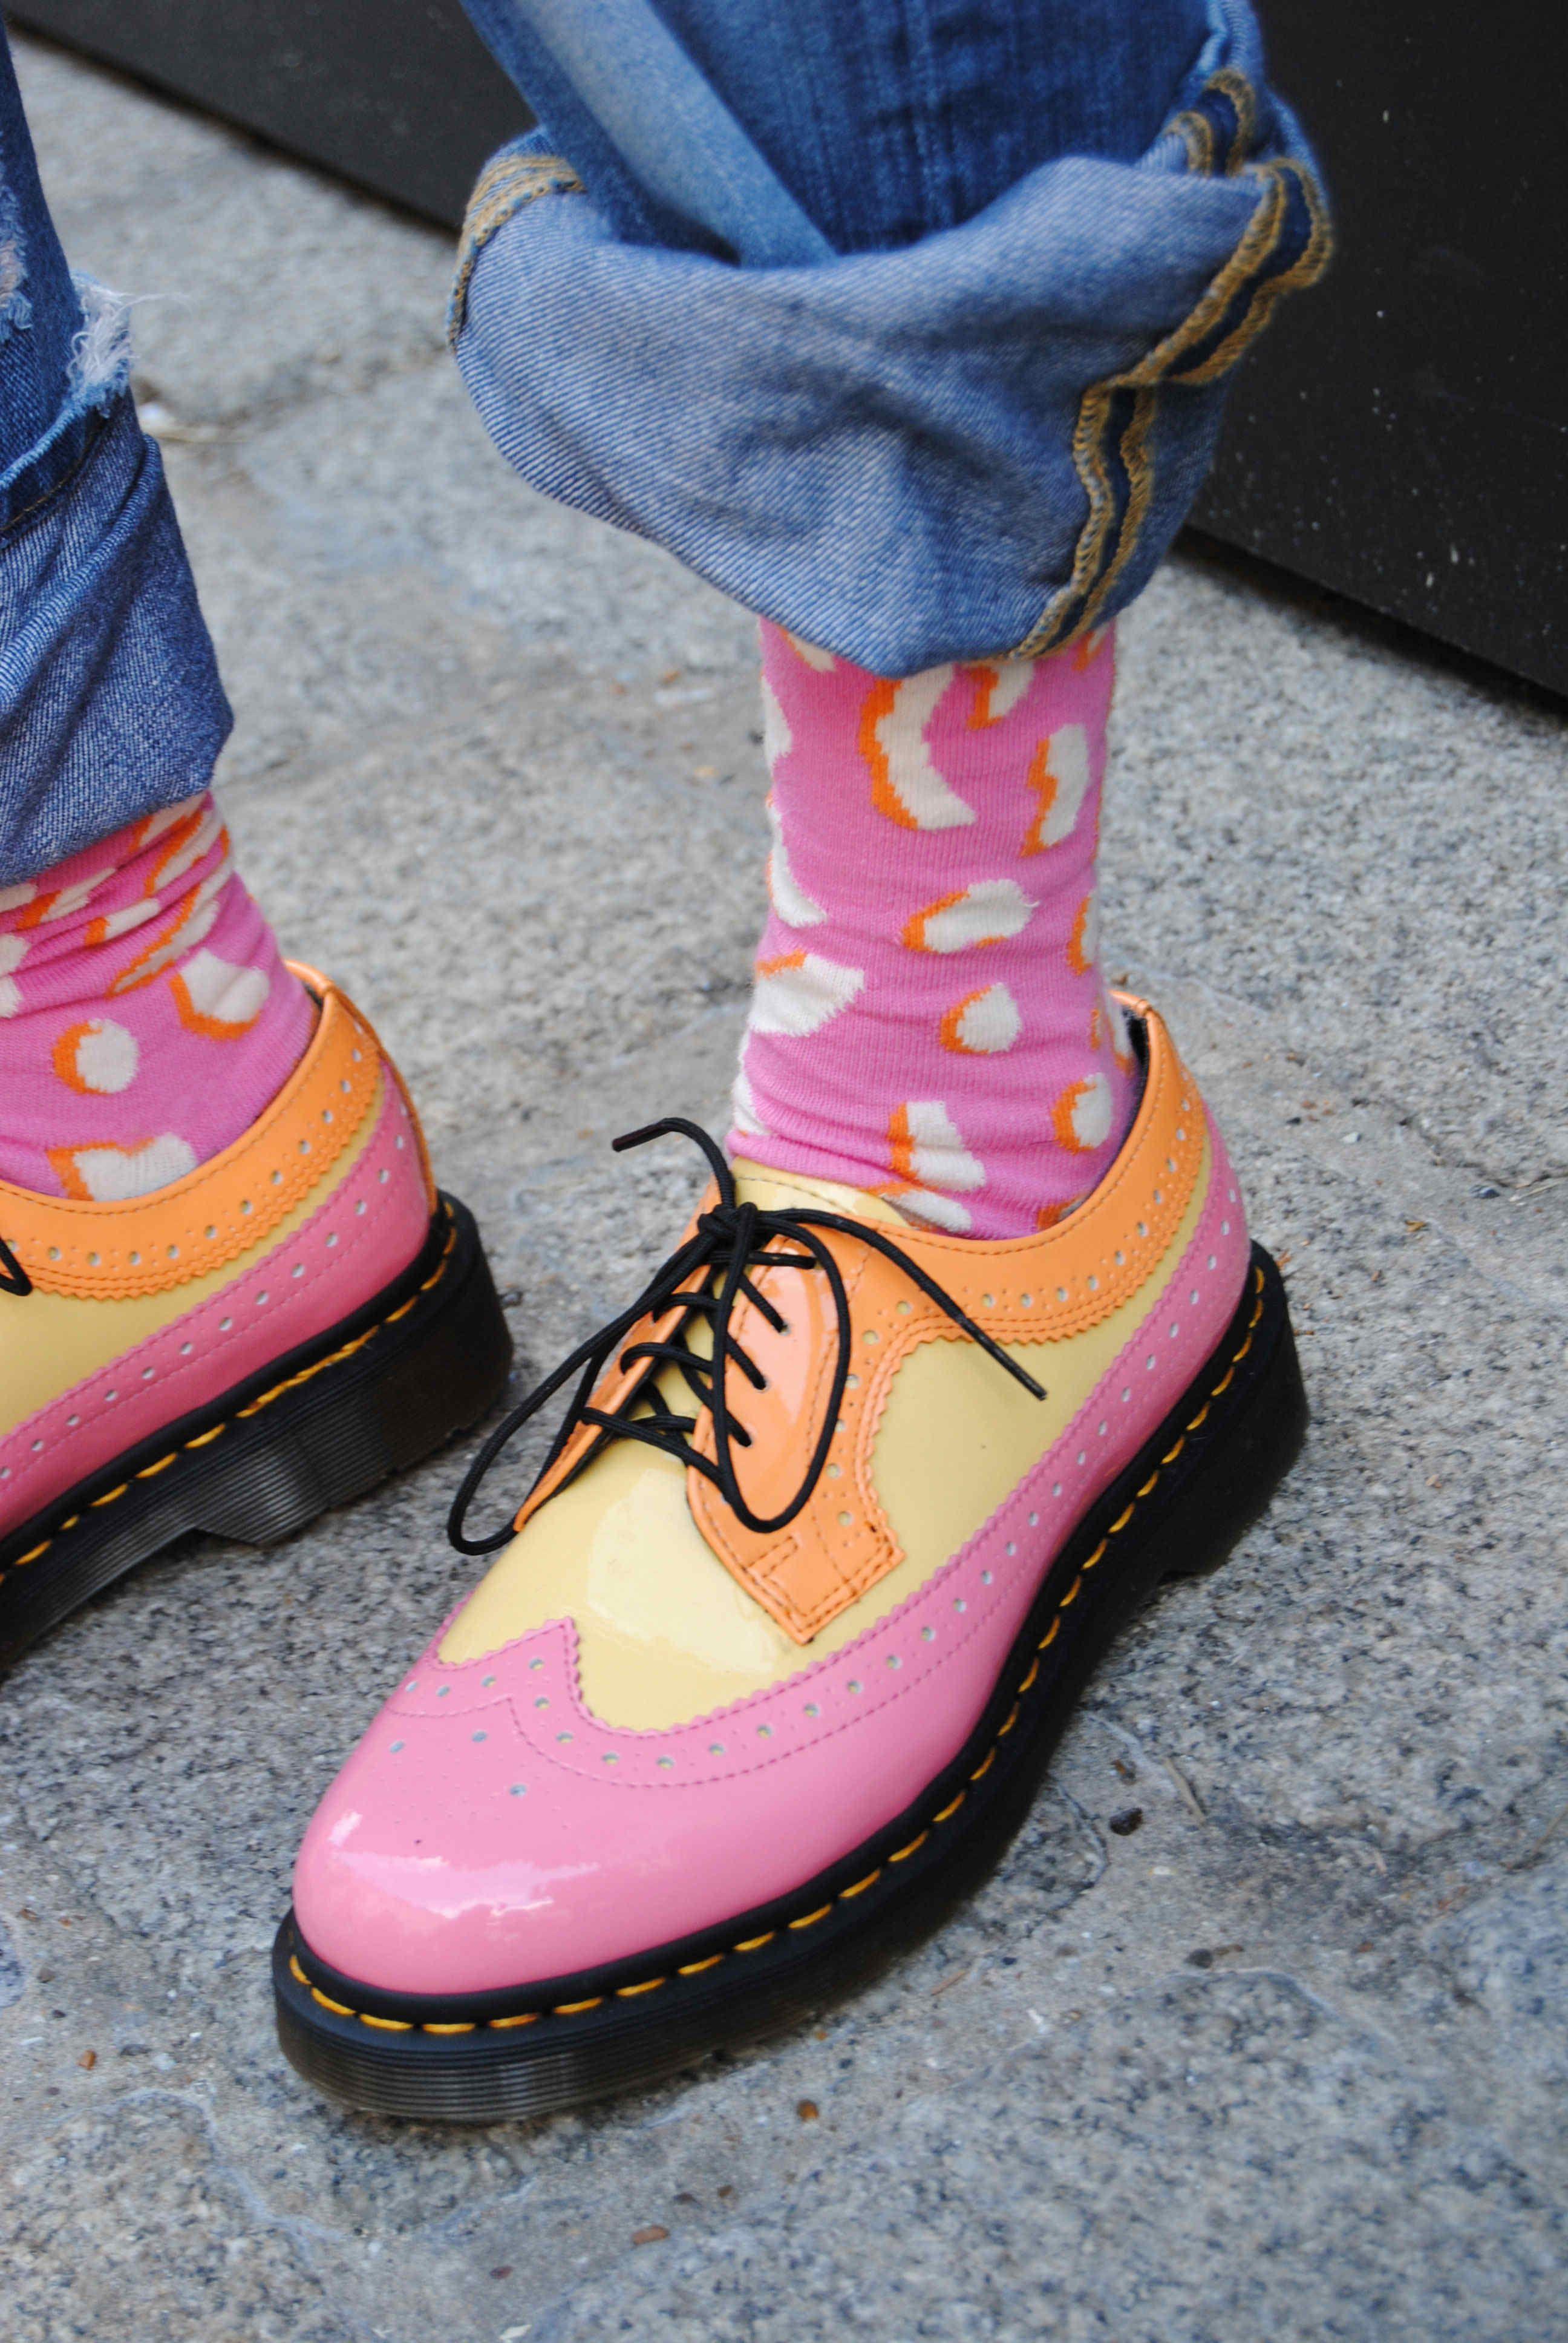 Apprendimento Pranzo Grazia  Pin by L Smith on Clowning | Clown shoes, Fashion shoes, Shoes